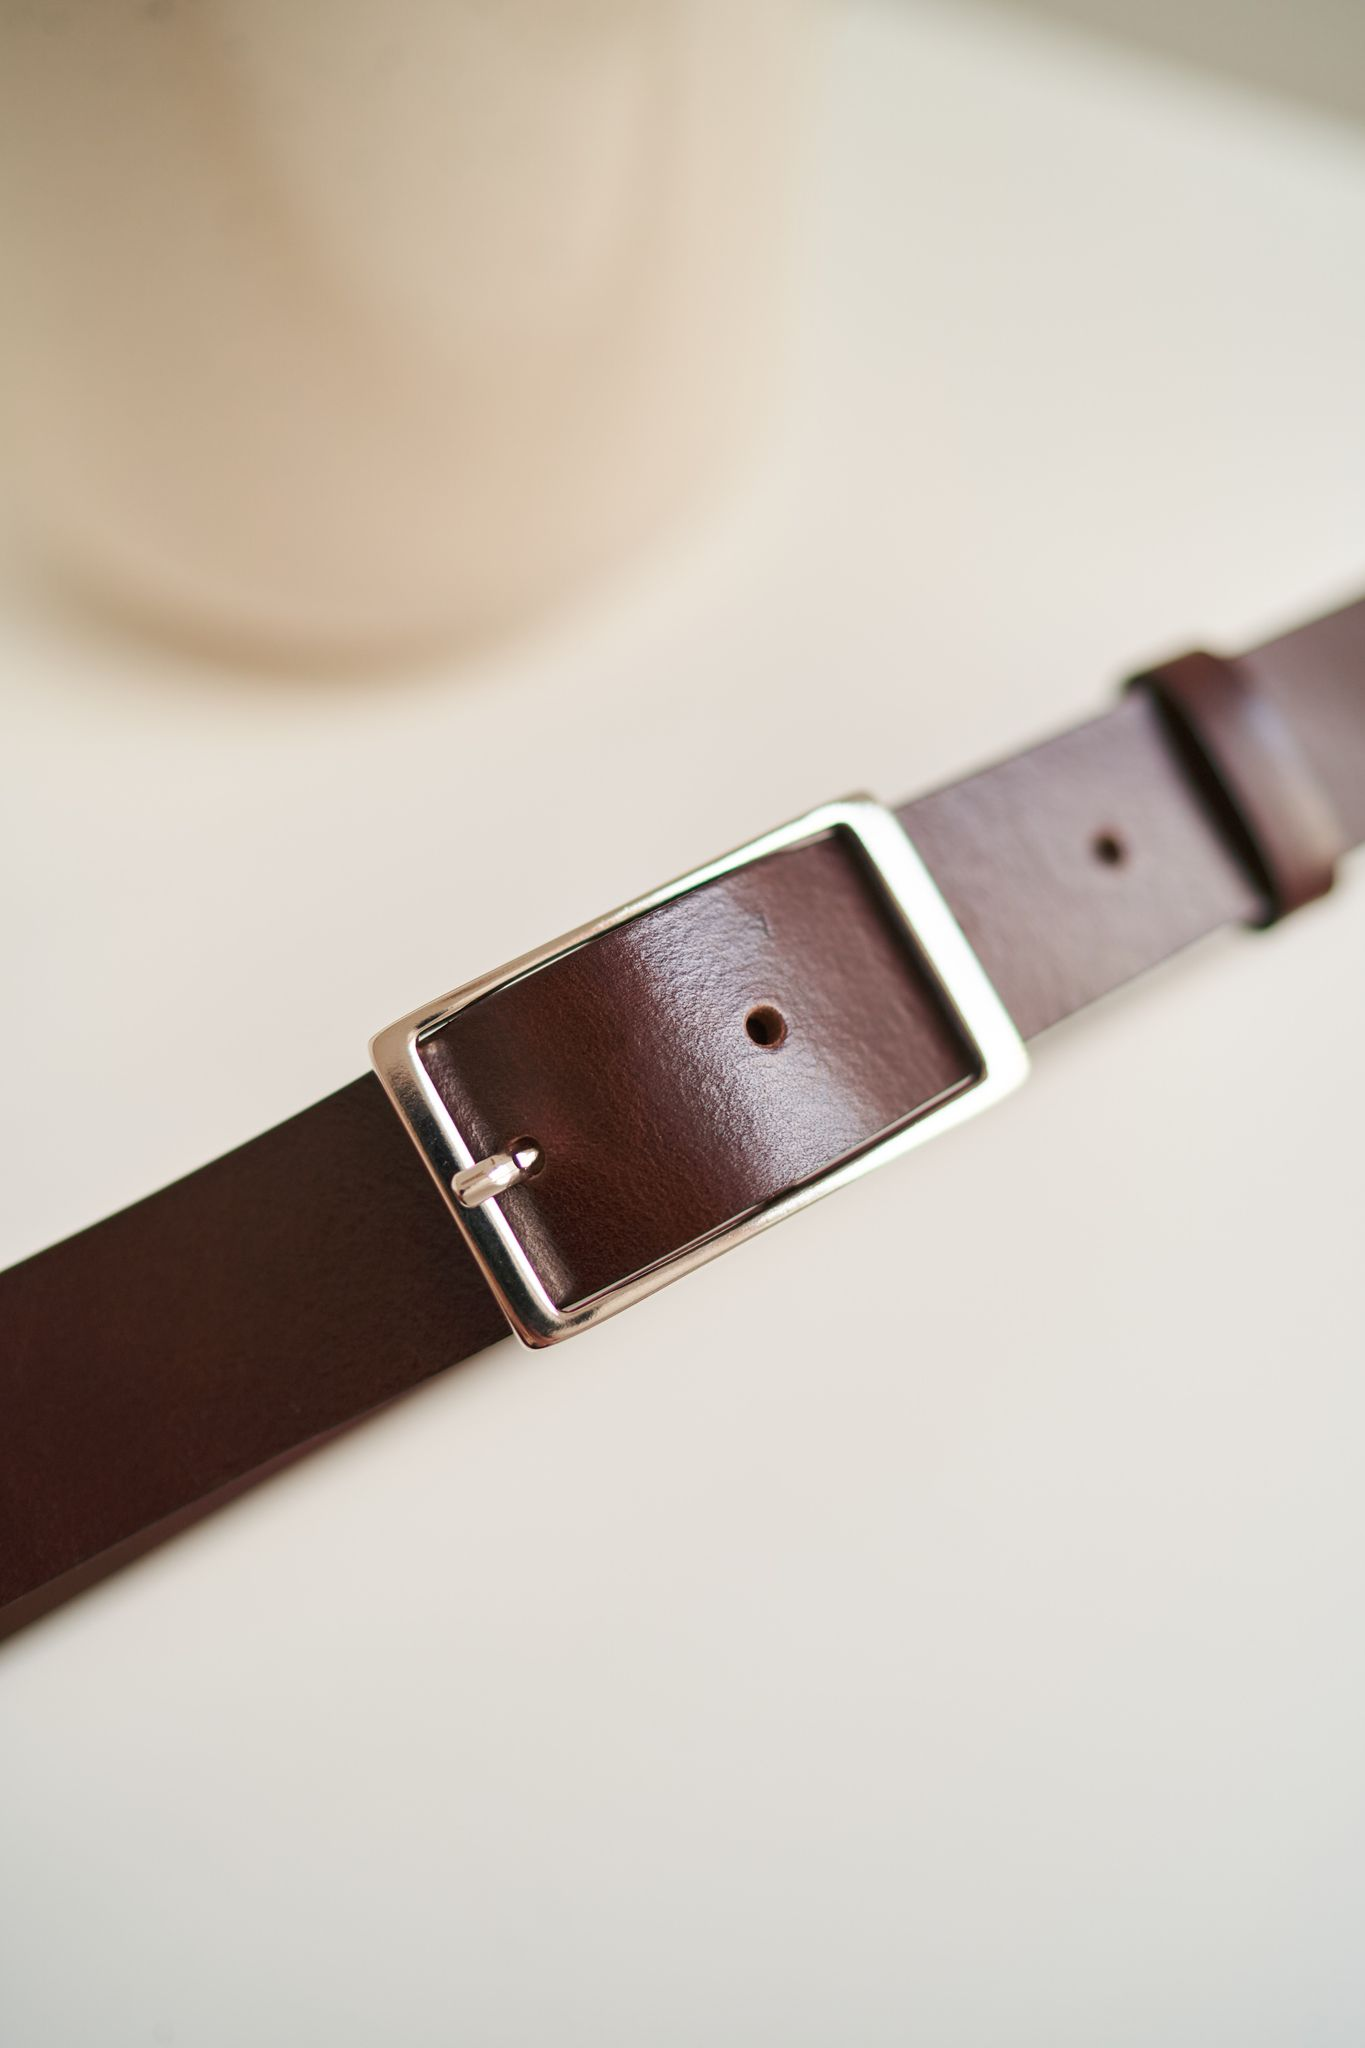 PASEK UNIQUE & CLASSY ciemny brąz srebrna klasyczna prostokątna klamra do spodni - Bellera   JestemSlow.pl